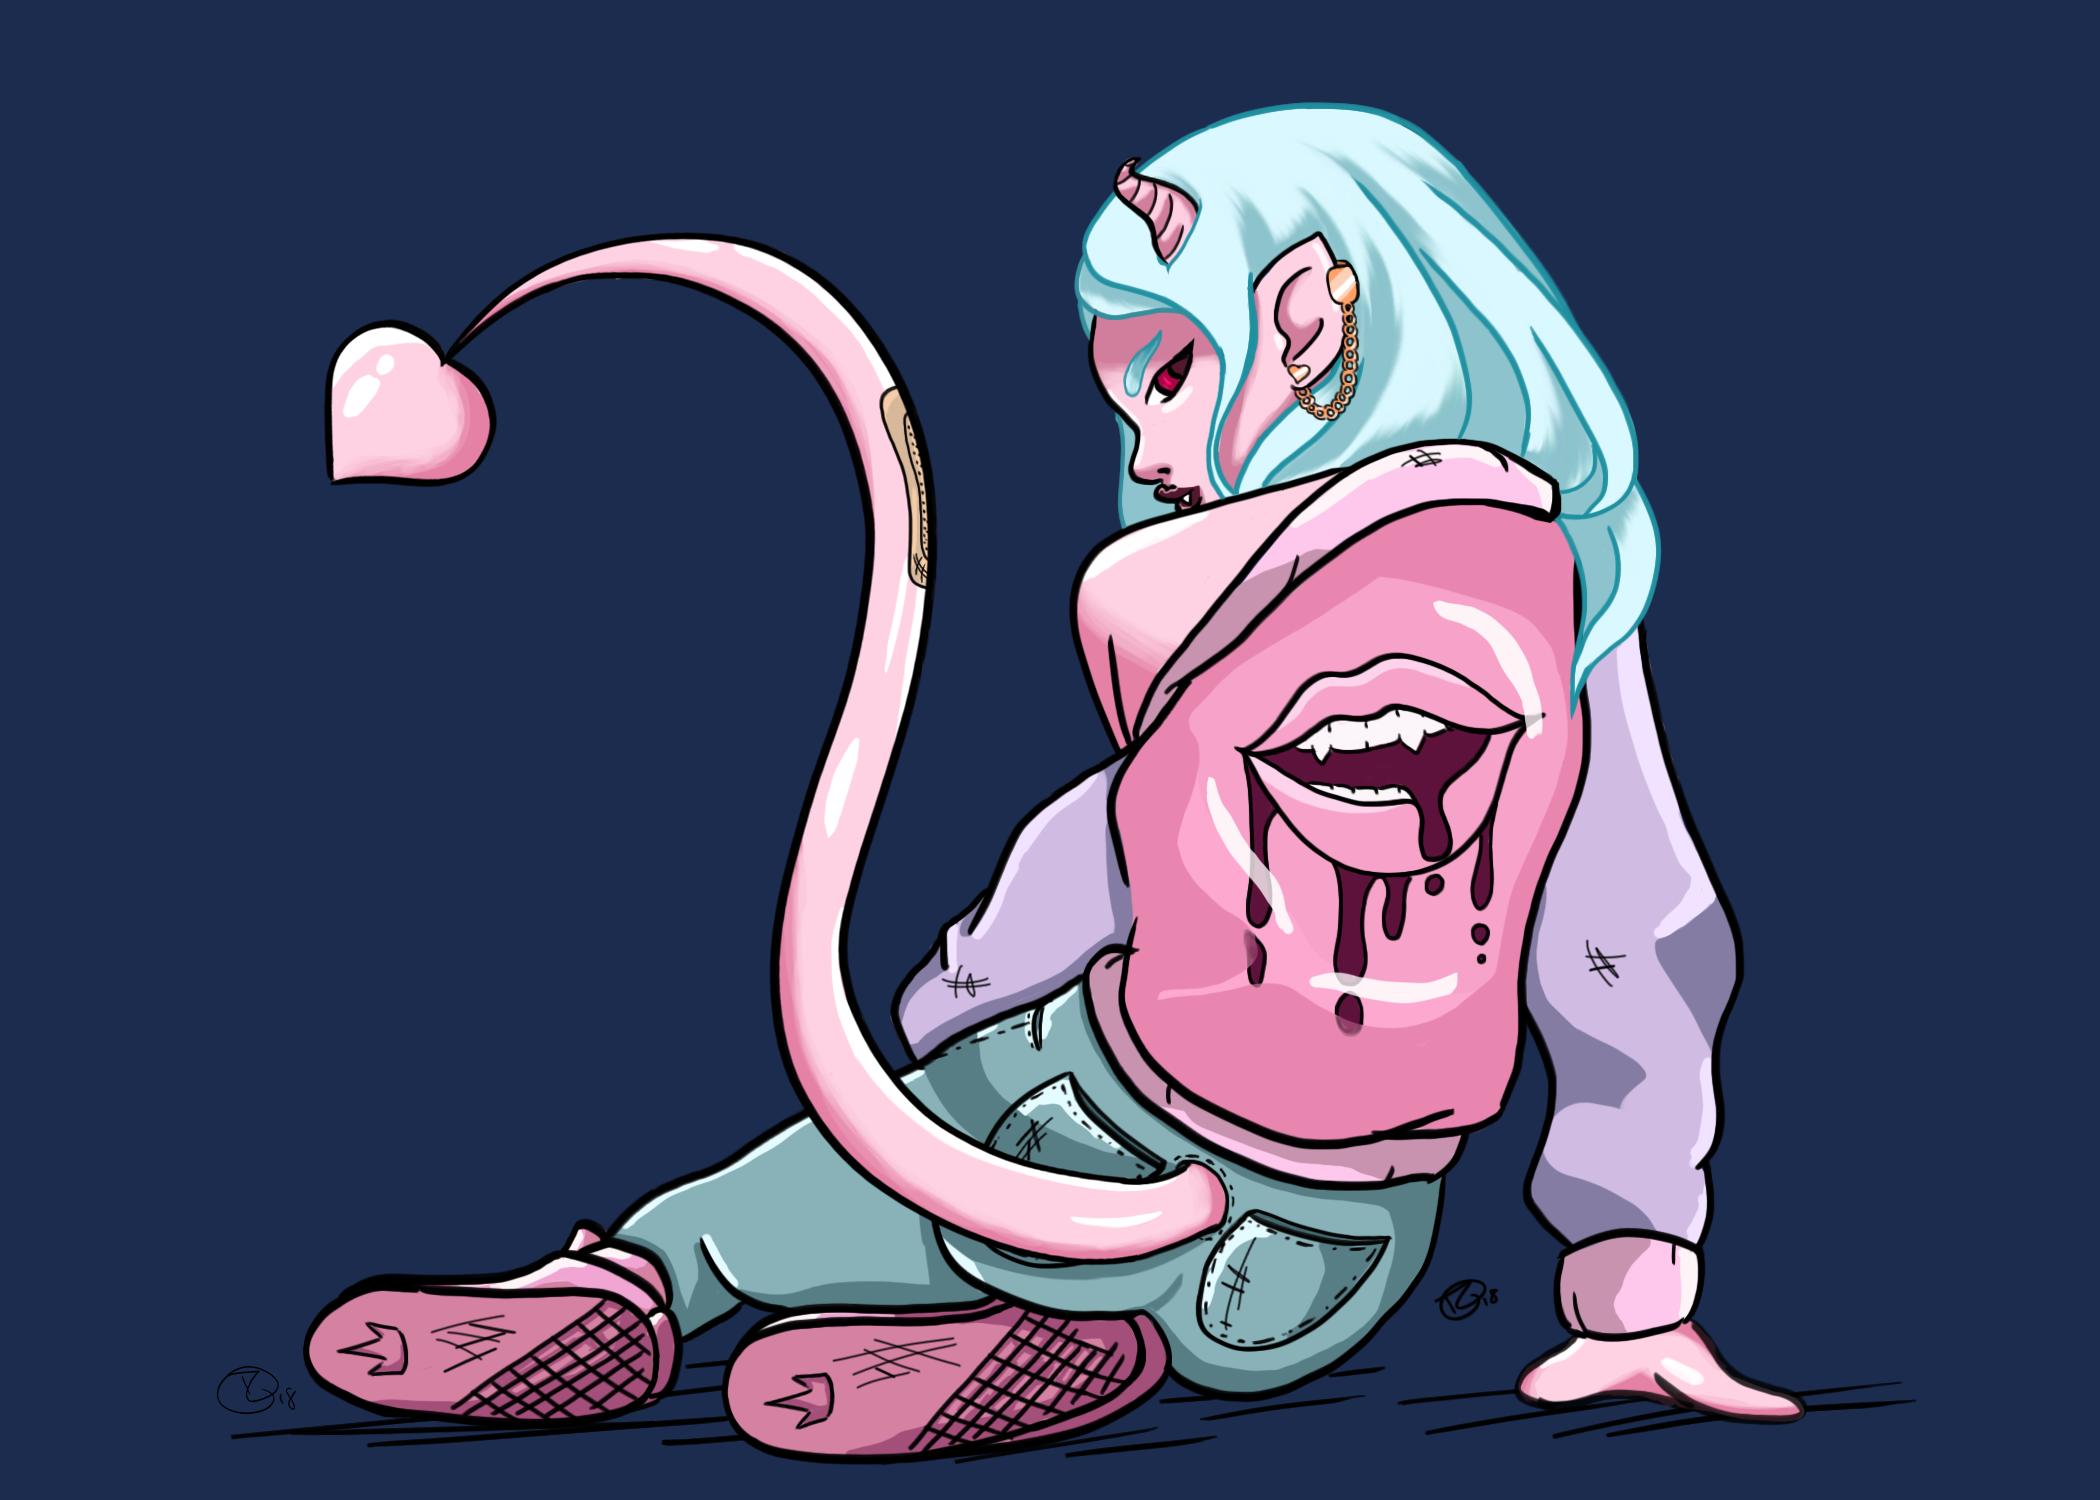 Demon Girl Illustration, Personal Original Character